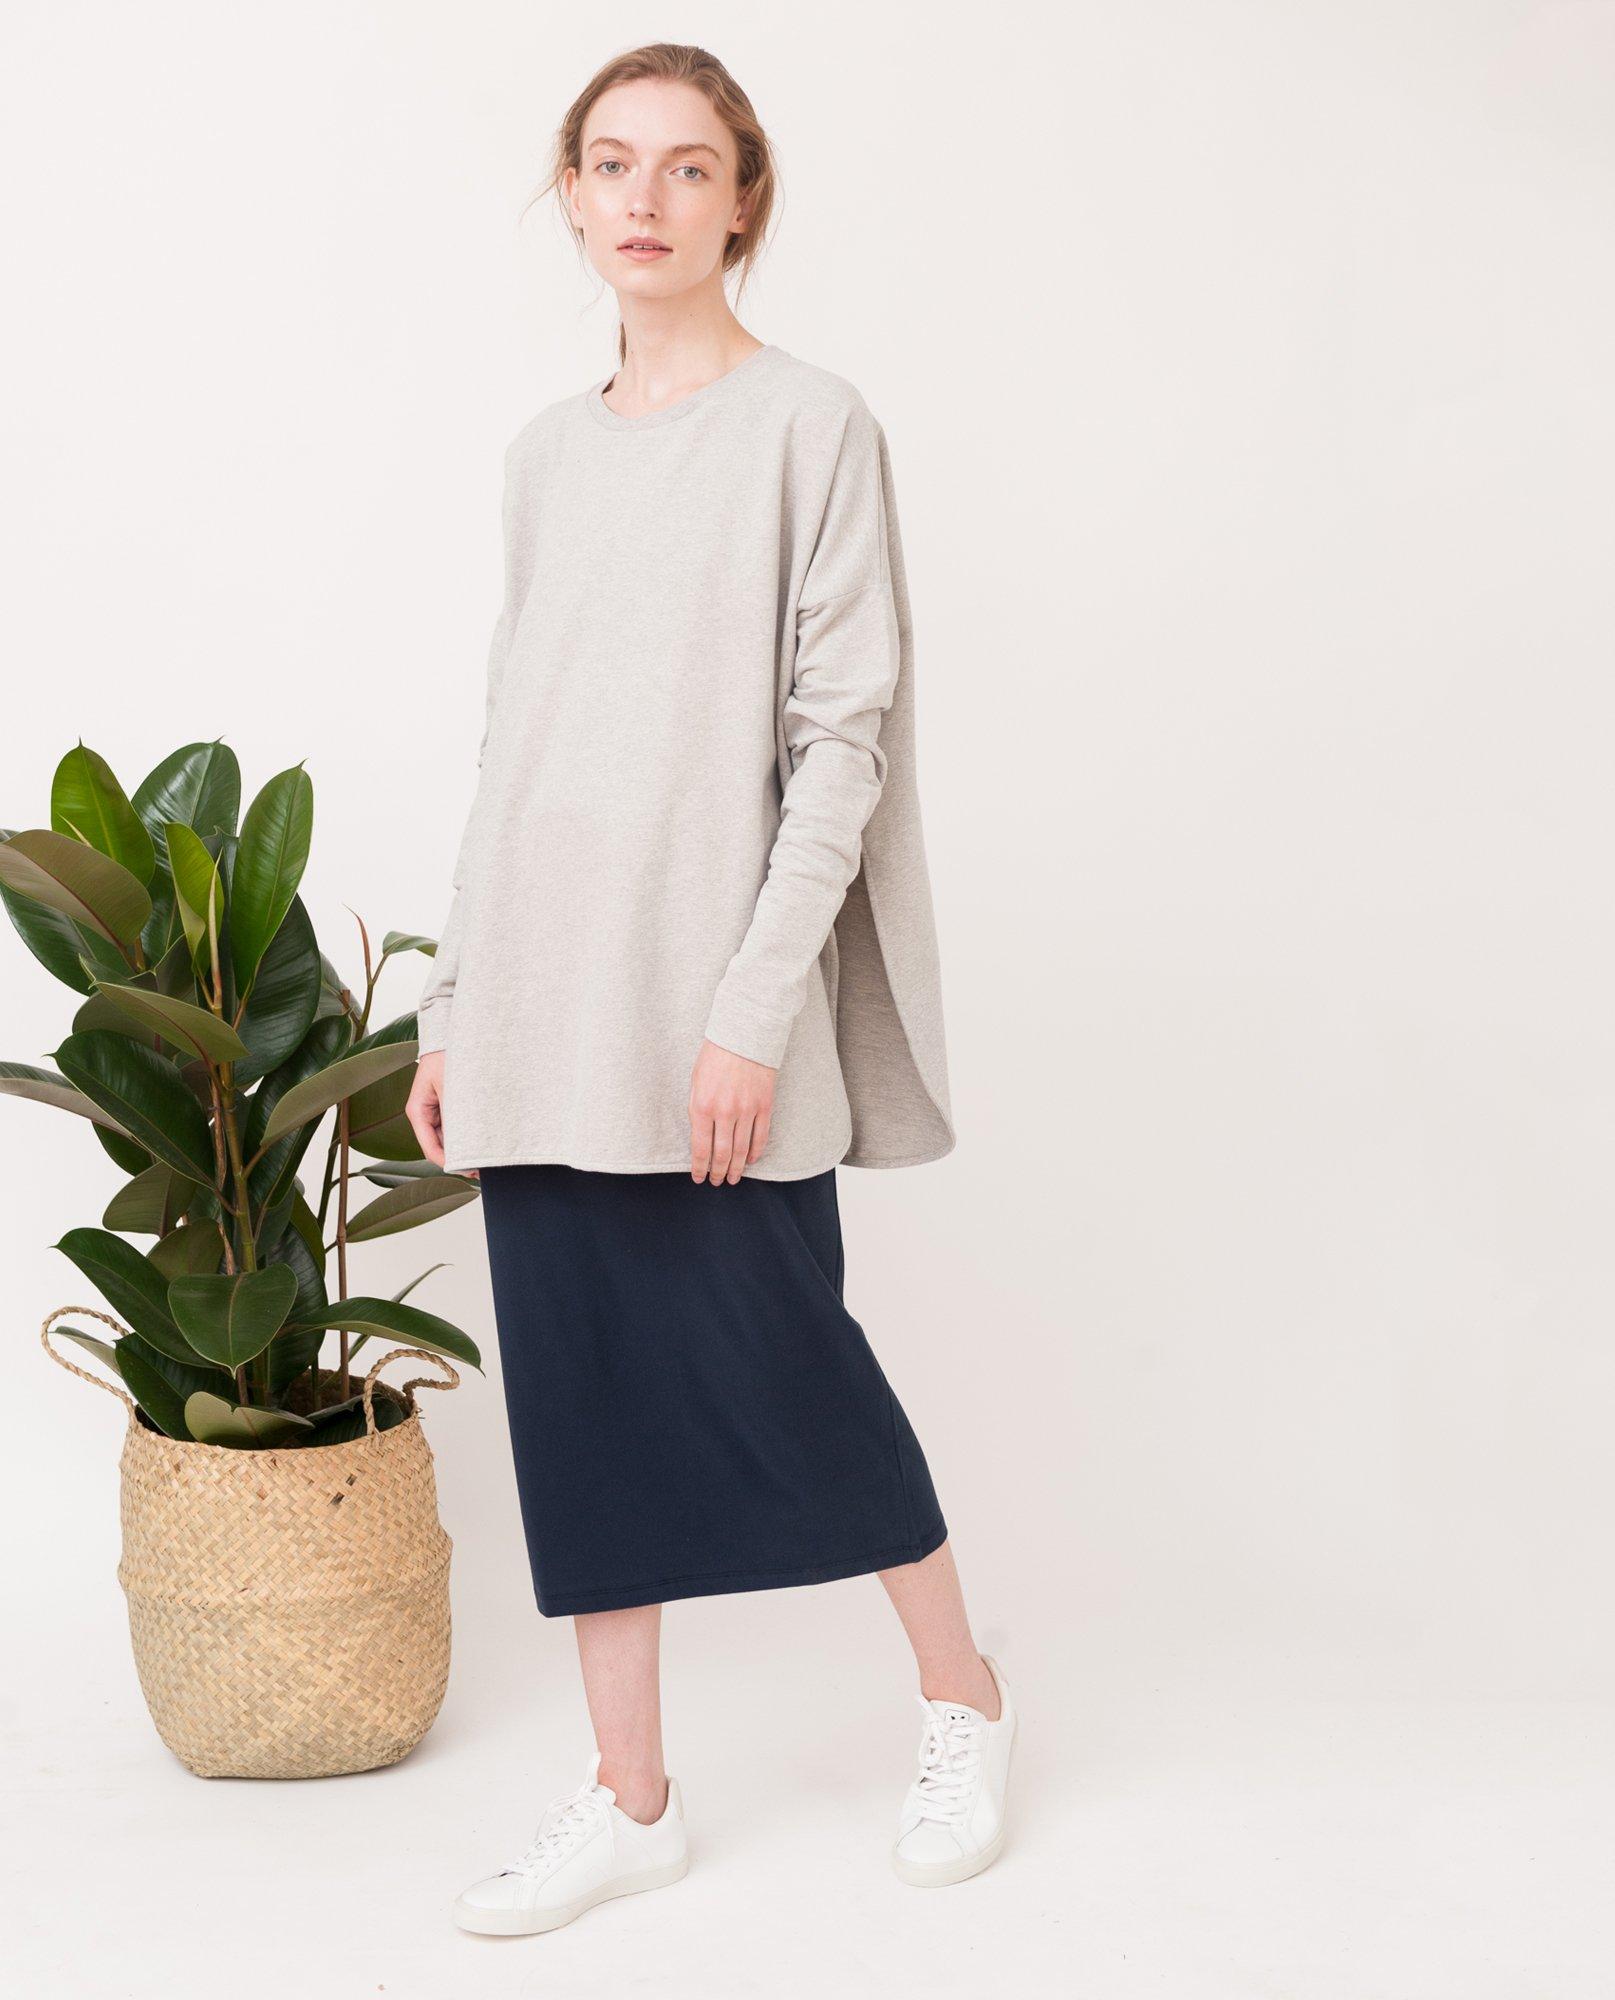 KATE Organic Cotton Sweatshirt In Light Grey from Beaumont Organic